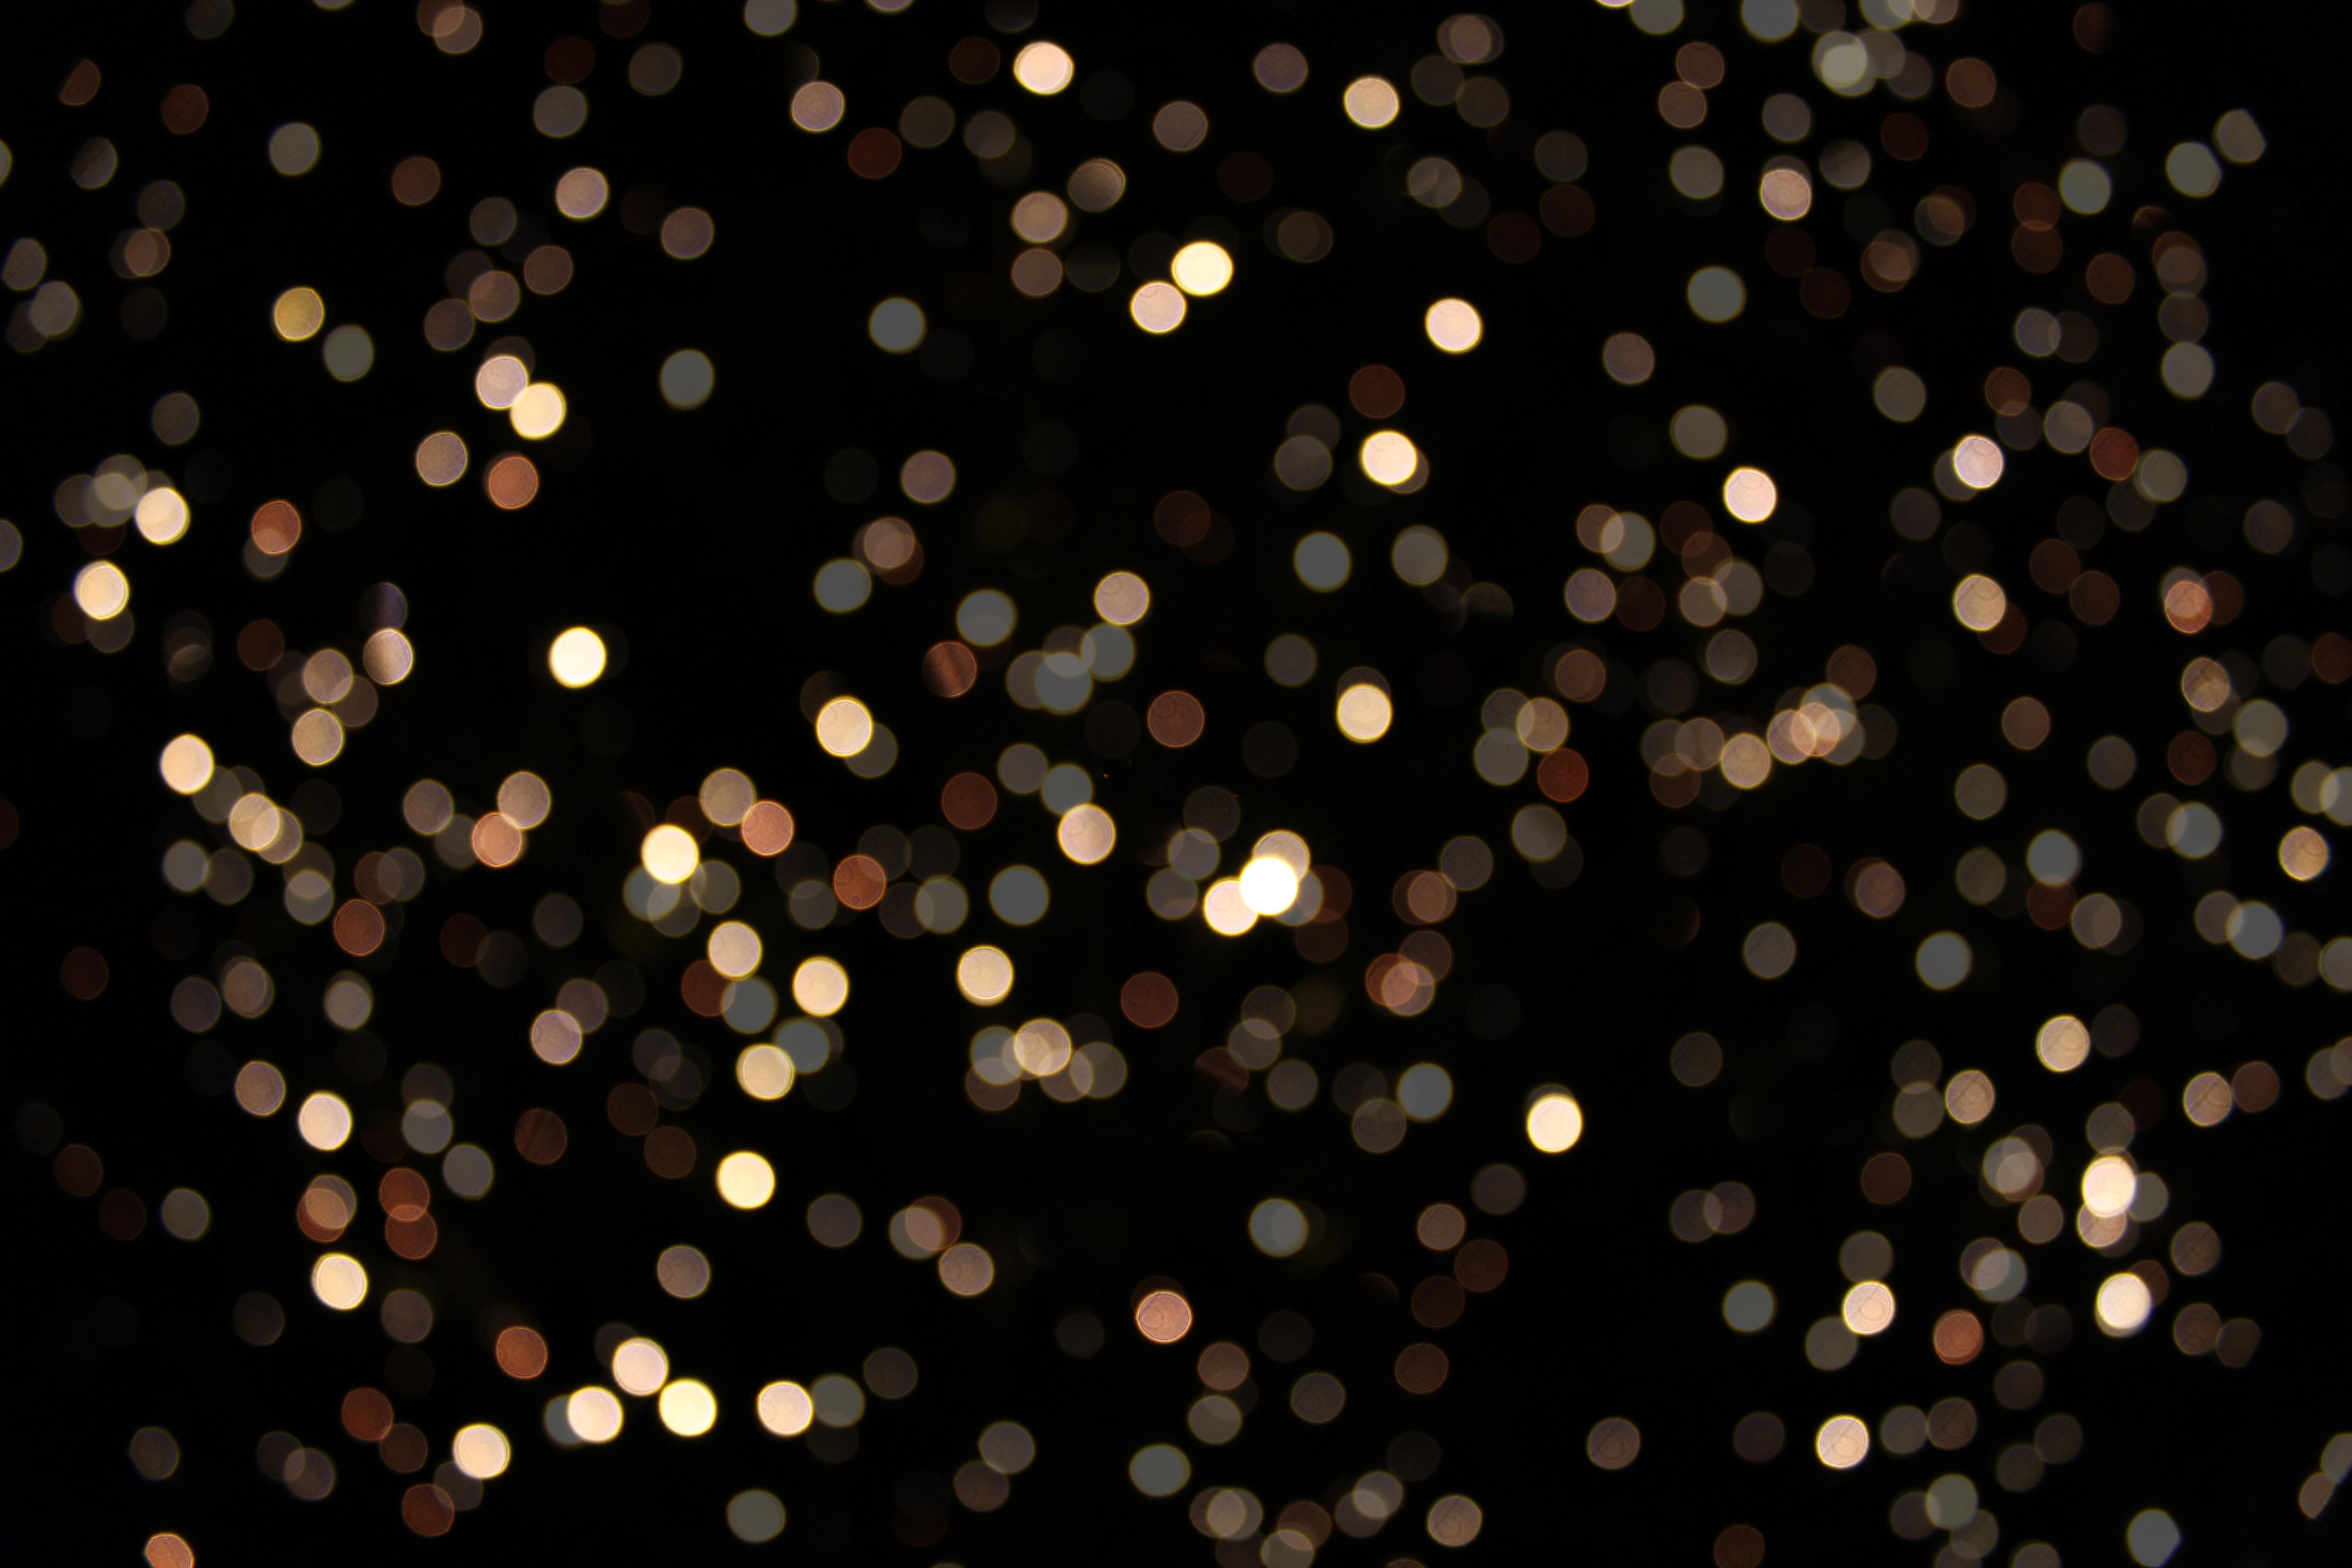 Bokeh - Golden Lights 5184 x 3456 Pixels